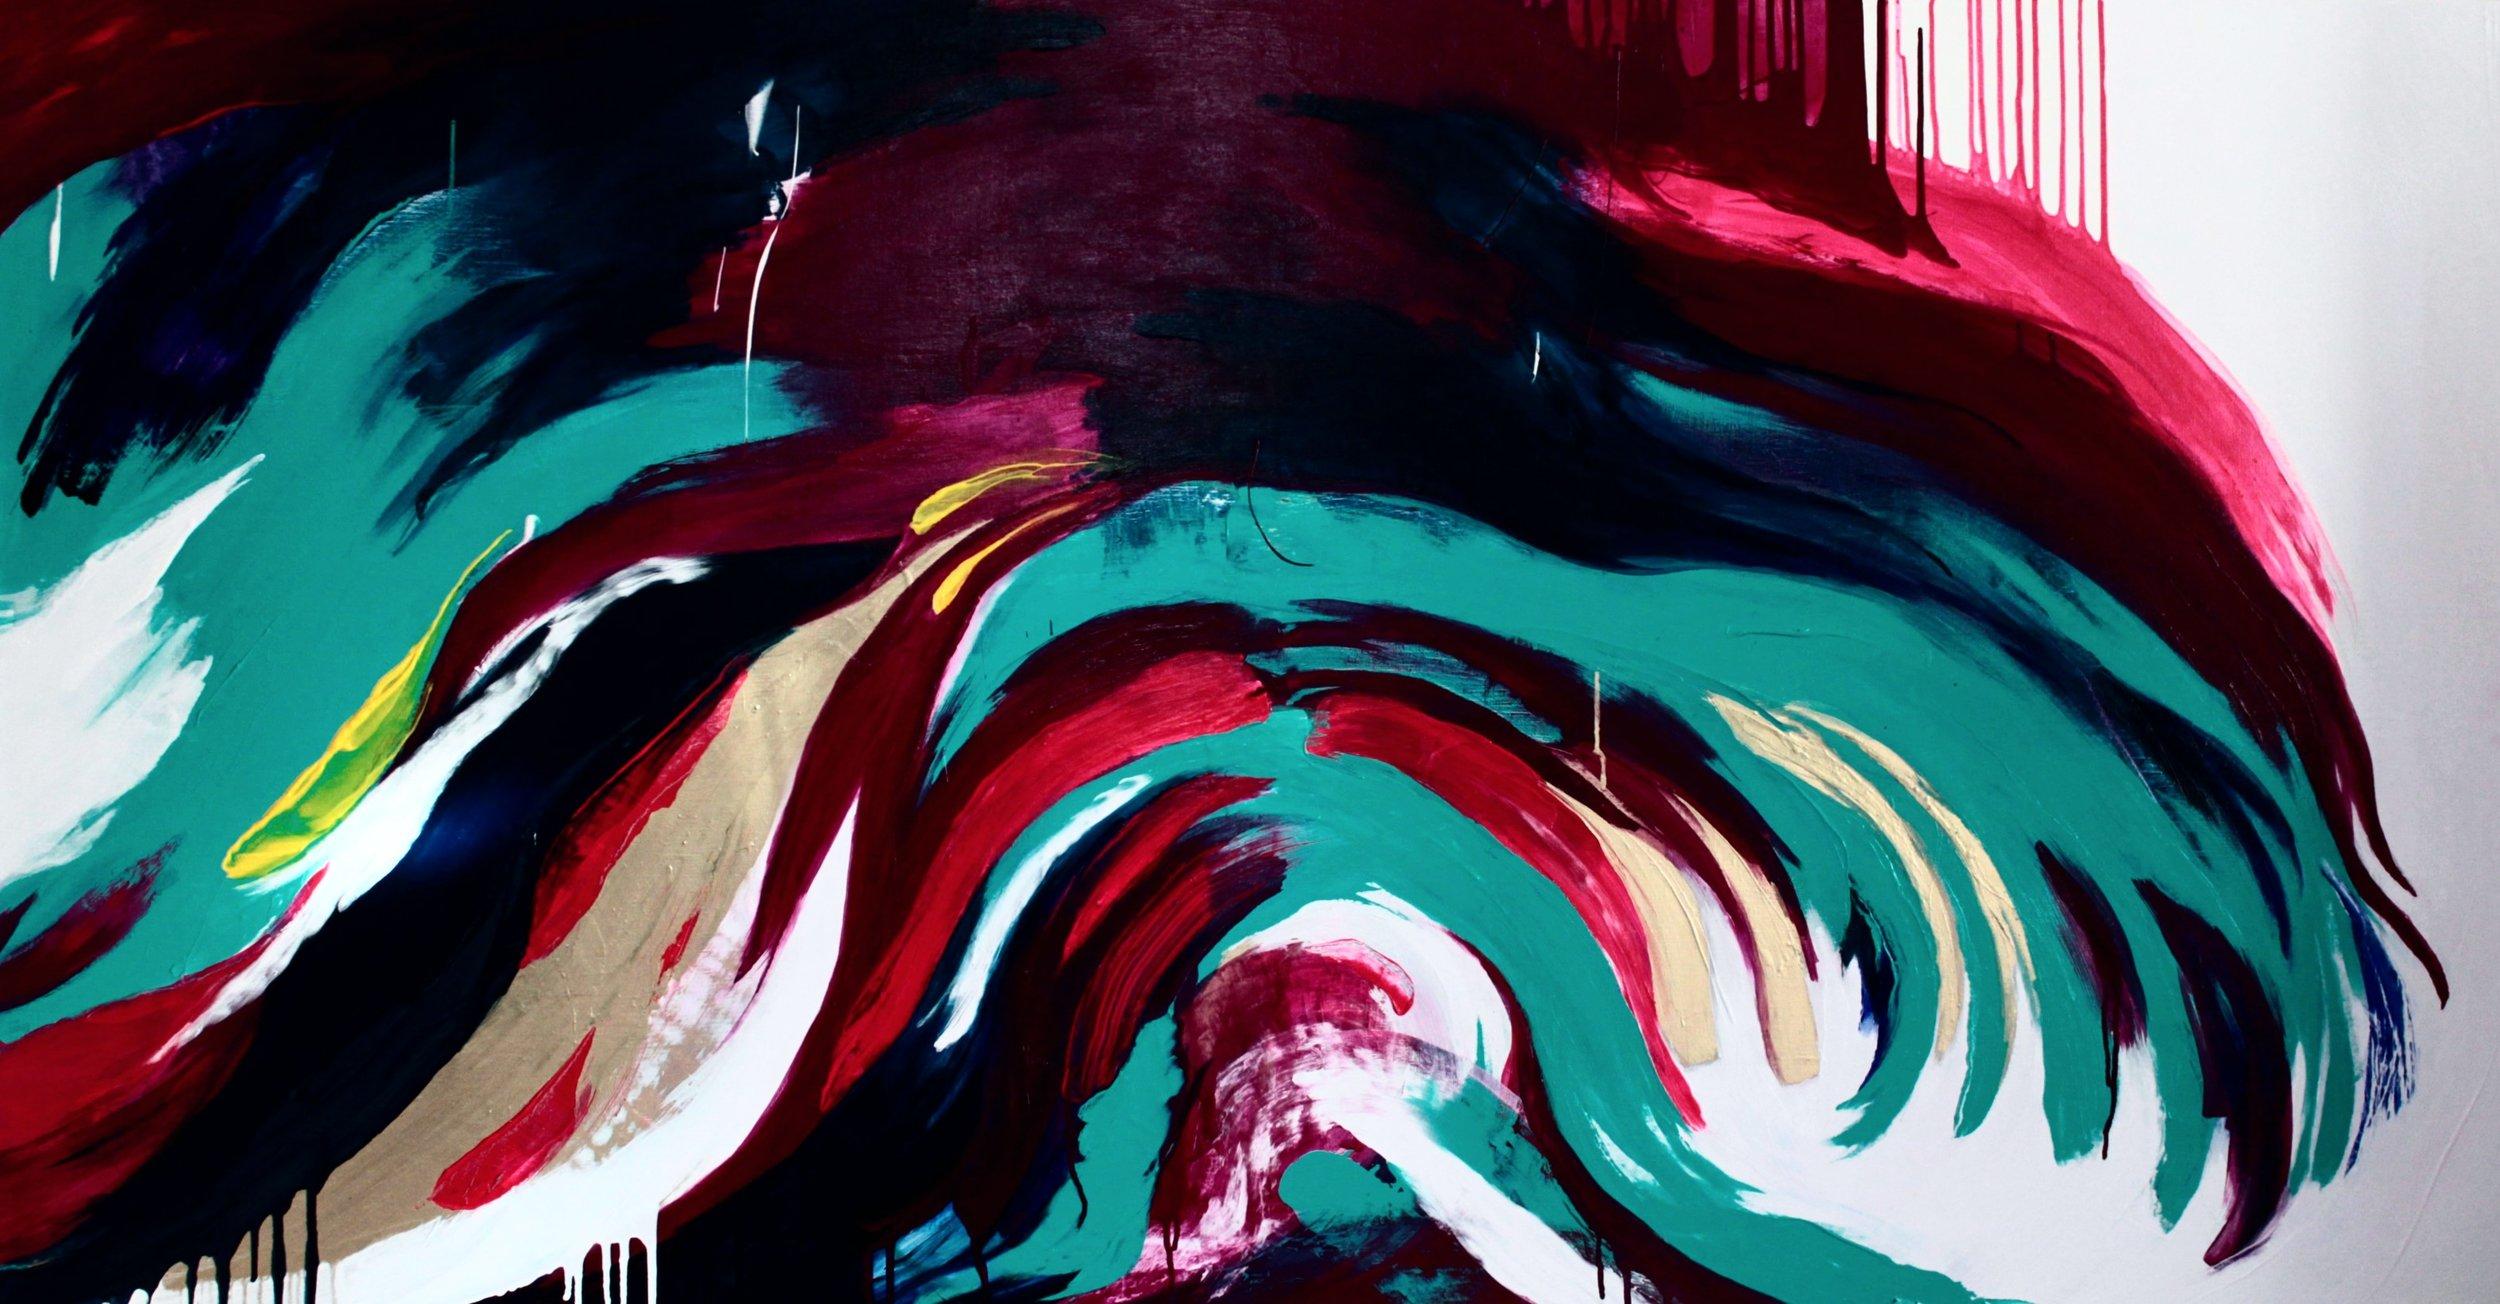 Fontána, Akryyli ja pigmentti kankaalle, 100 cm x 190 cm  Myyty / Sold